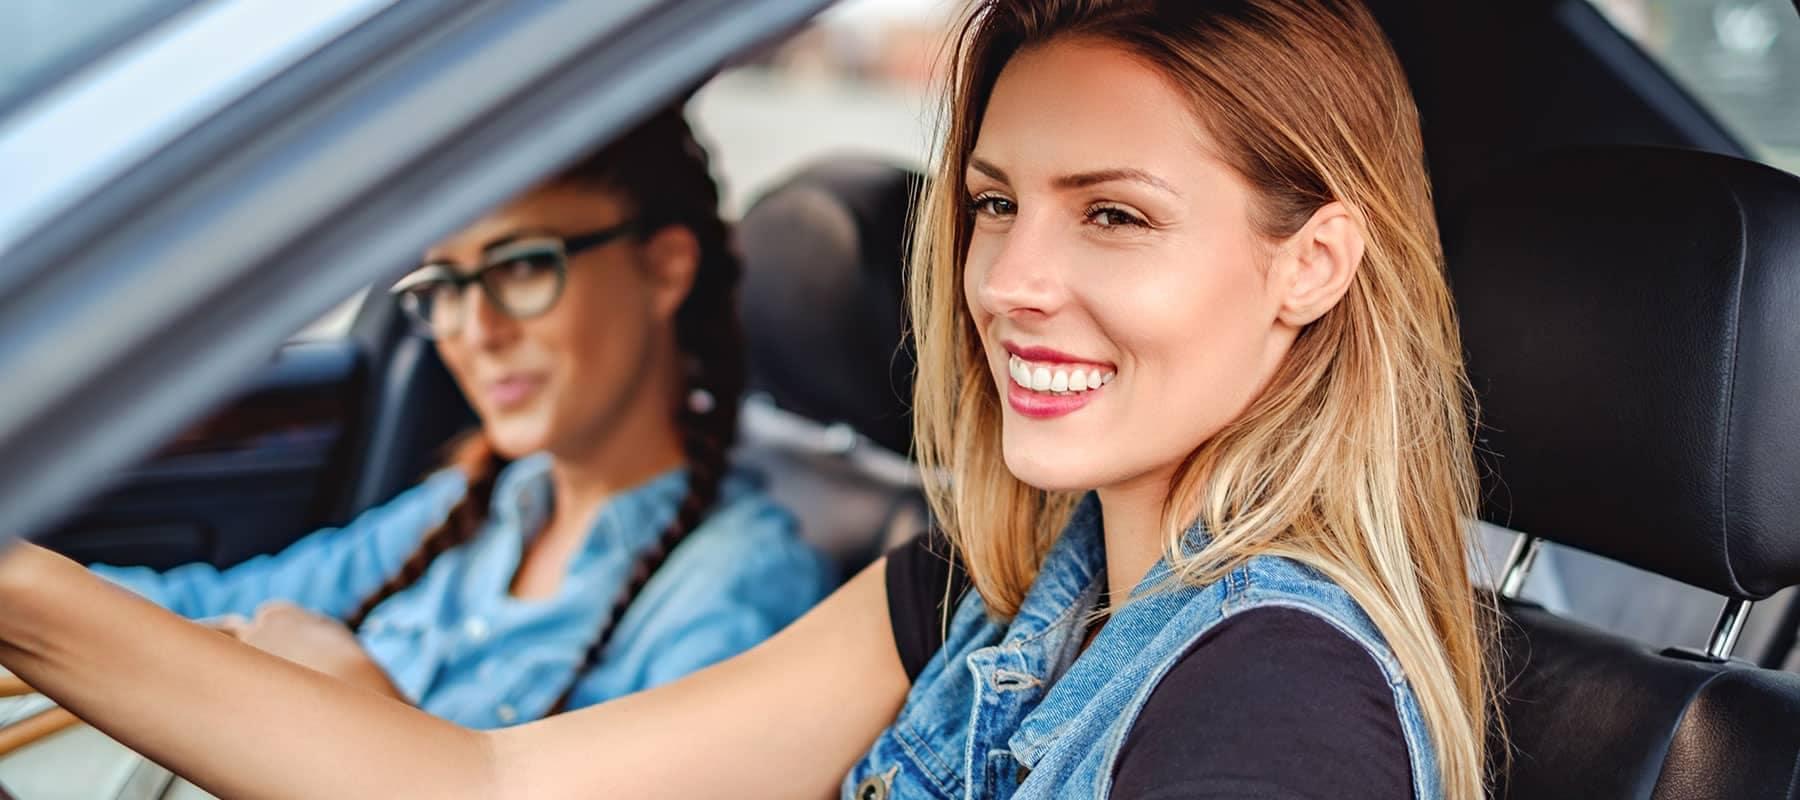 two women in car smiling